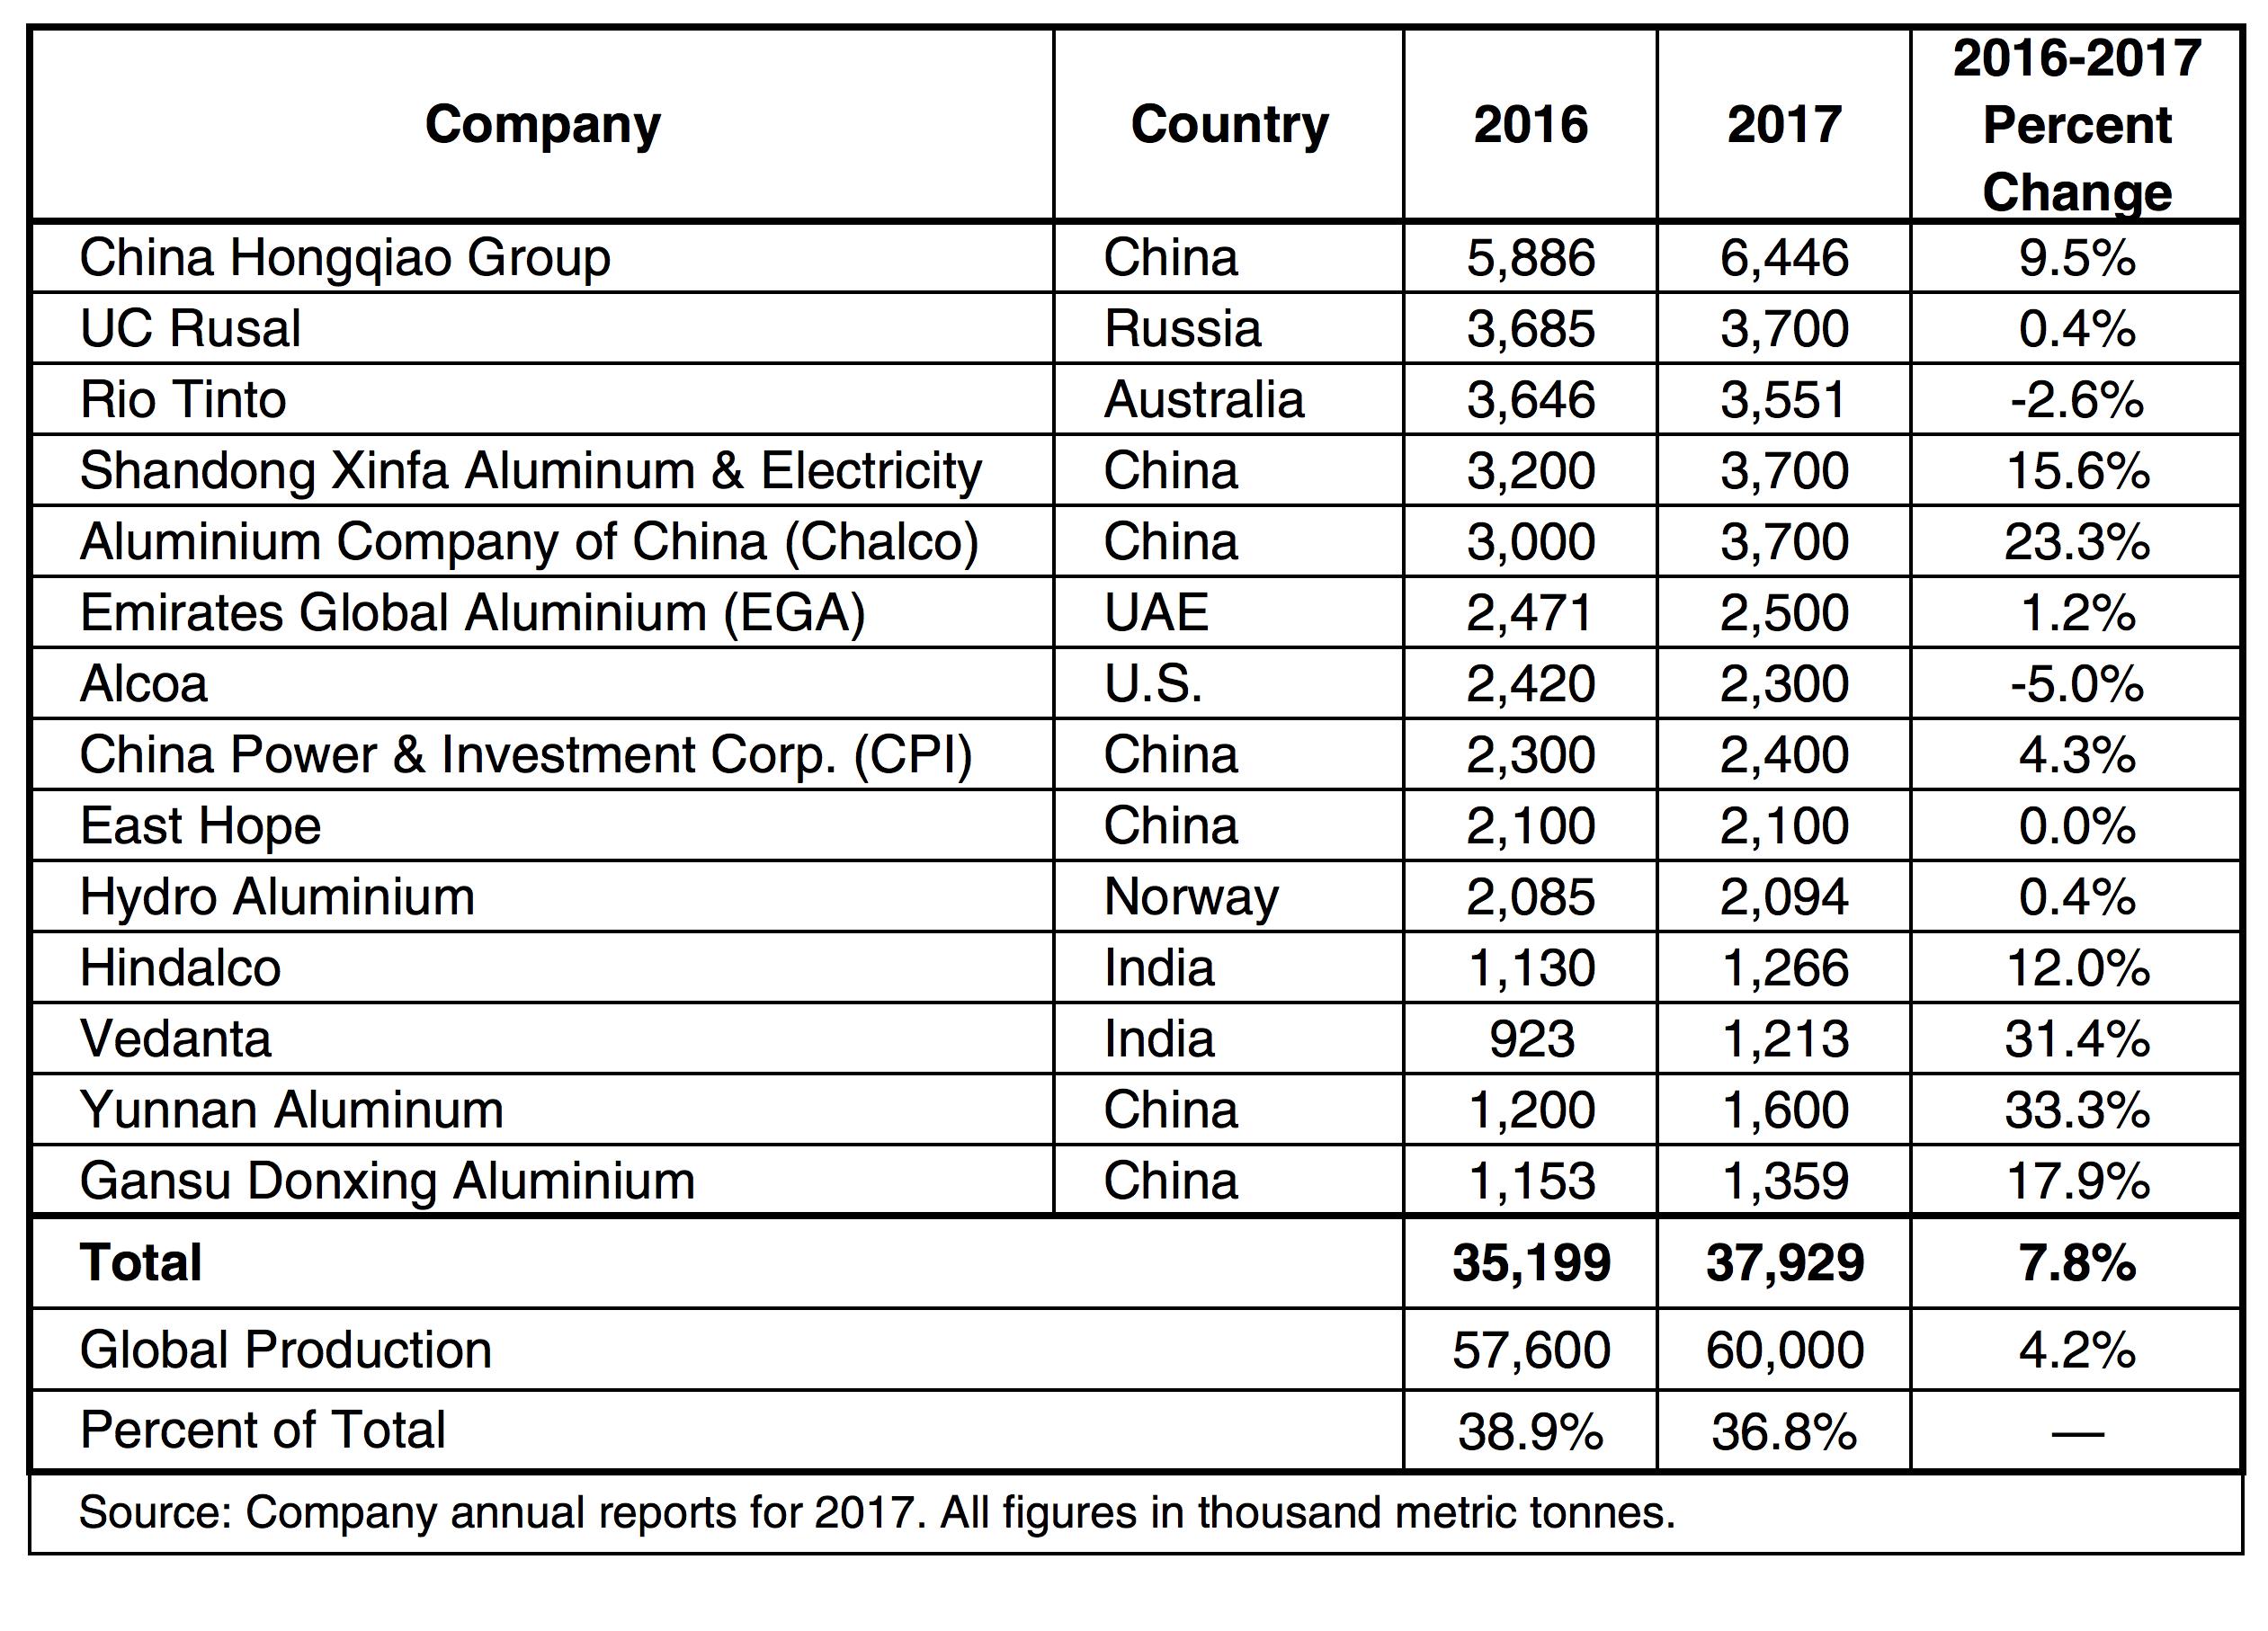 Table 2. World primary aluminium production by company (2116-2017).